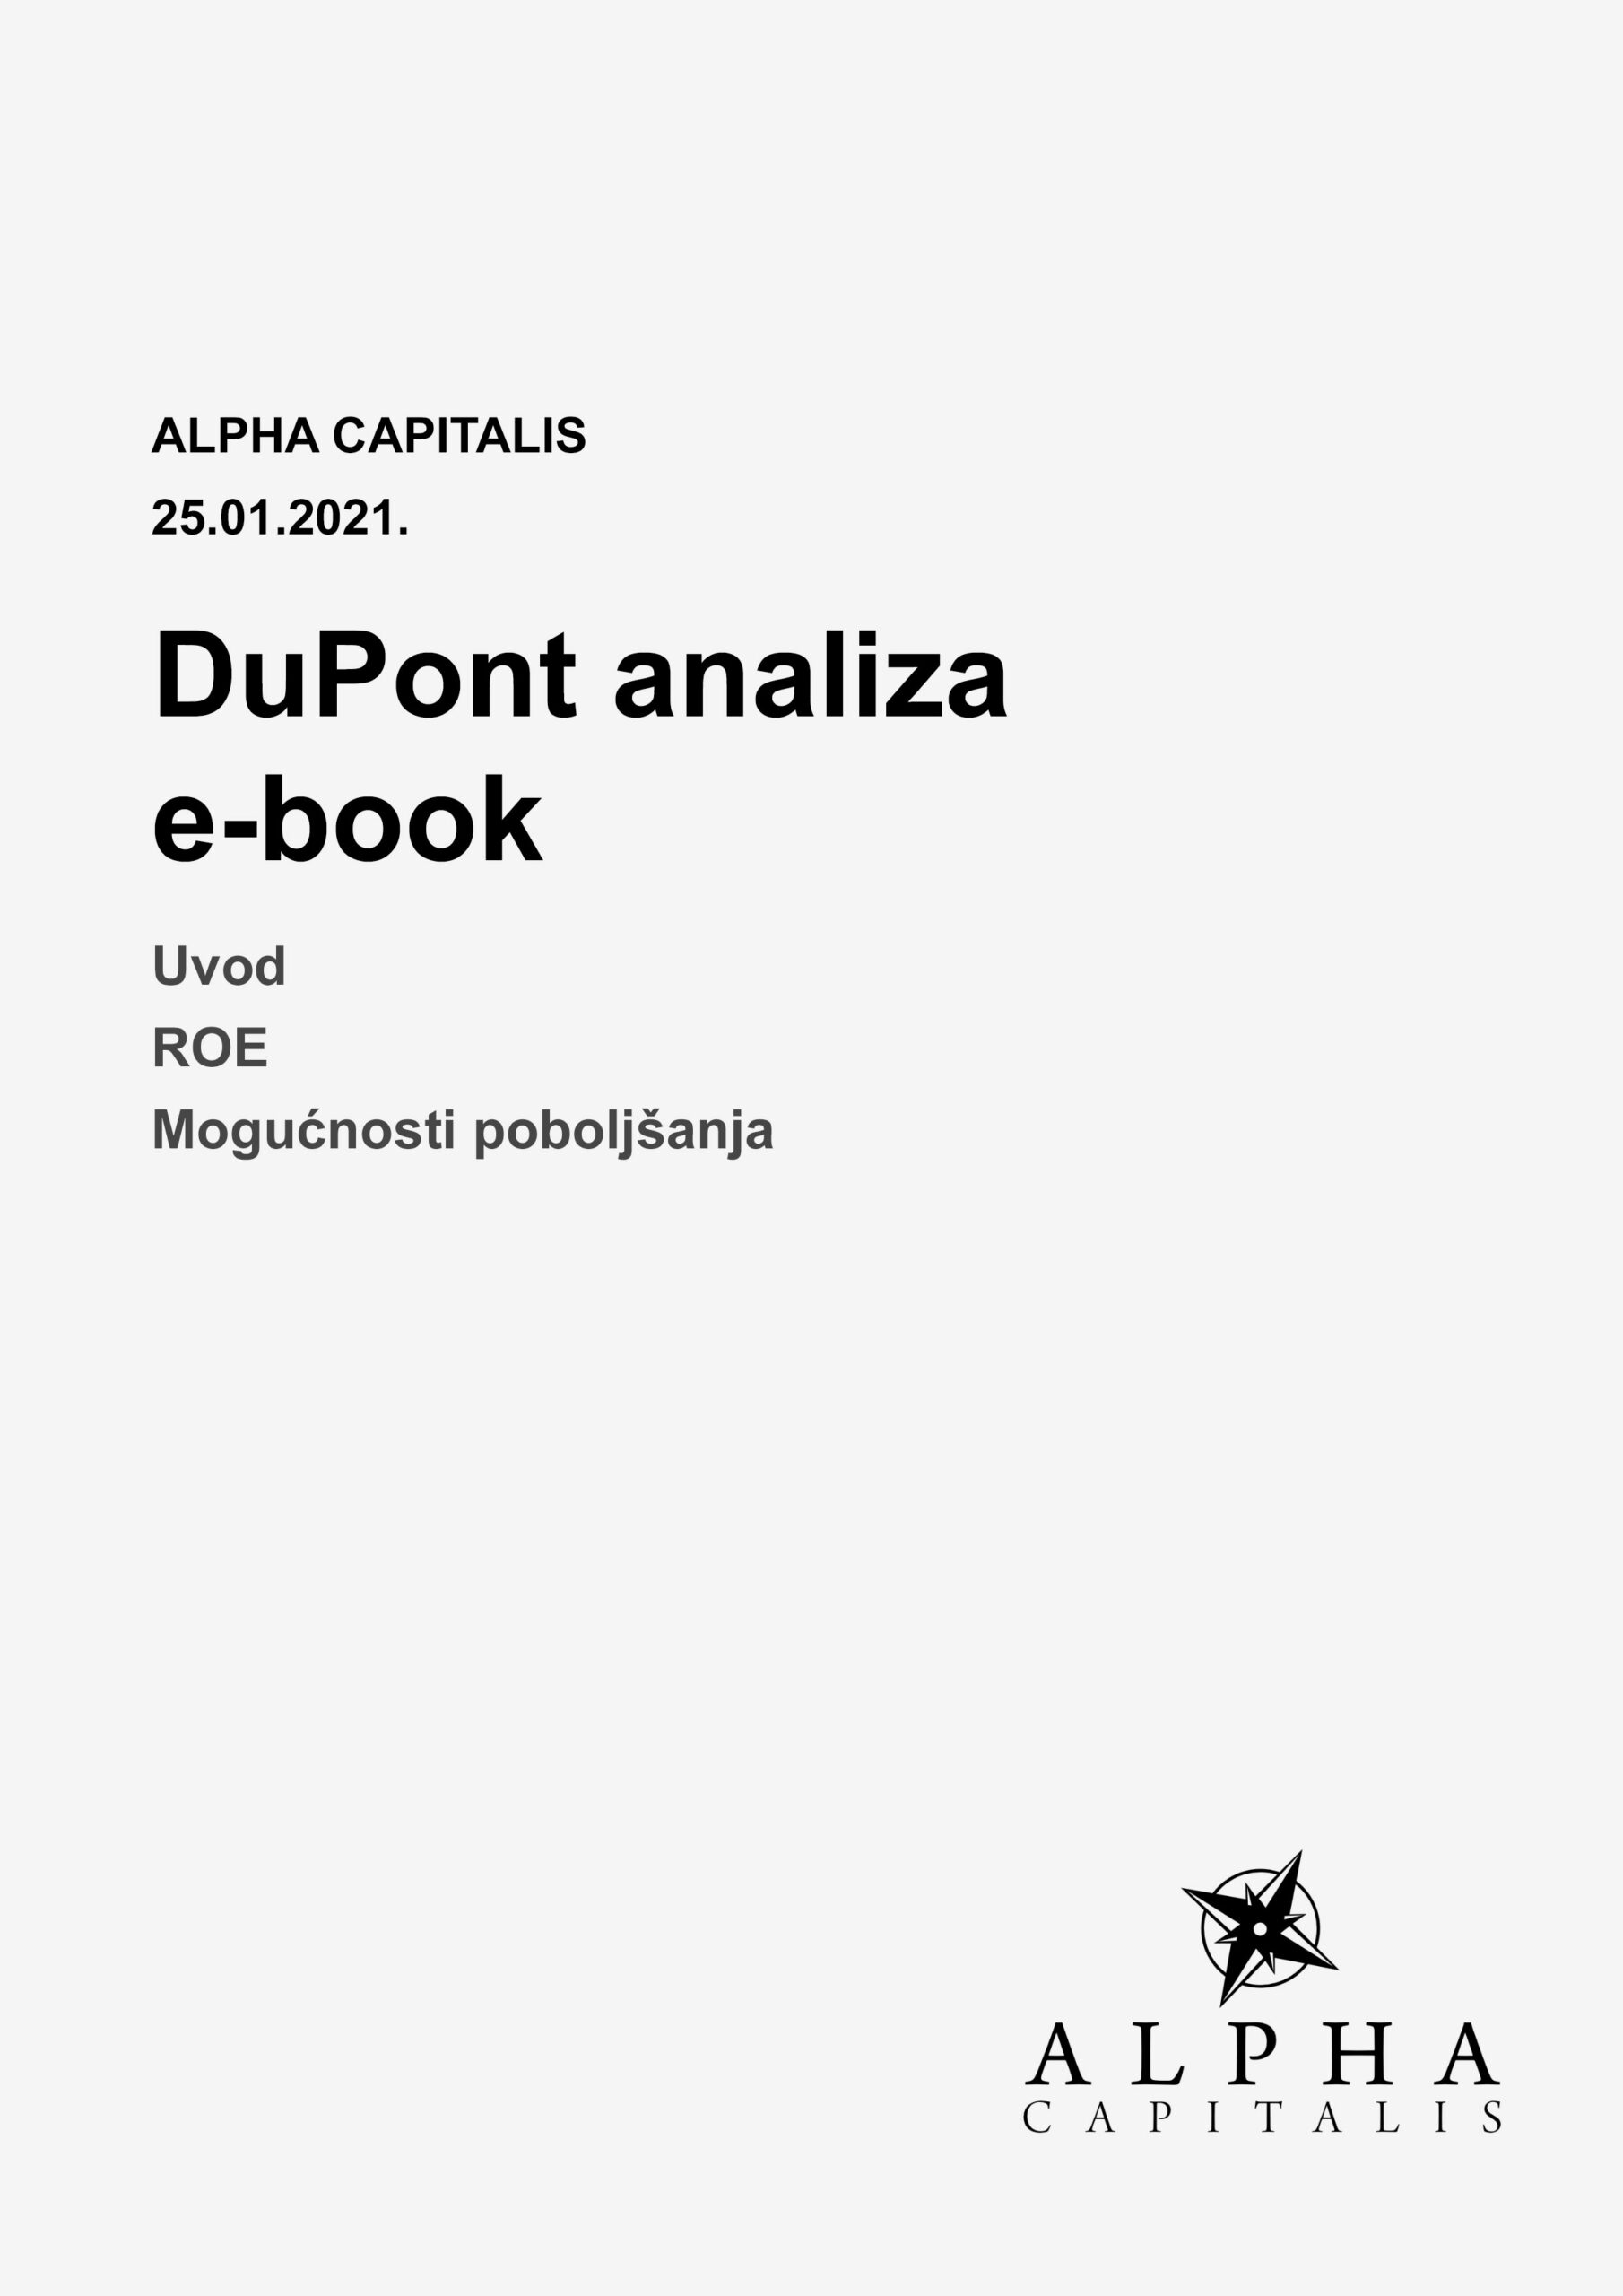 DuPont analiza